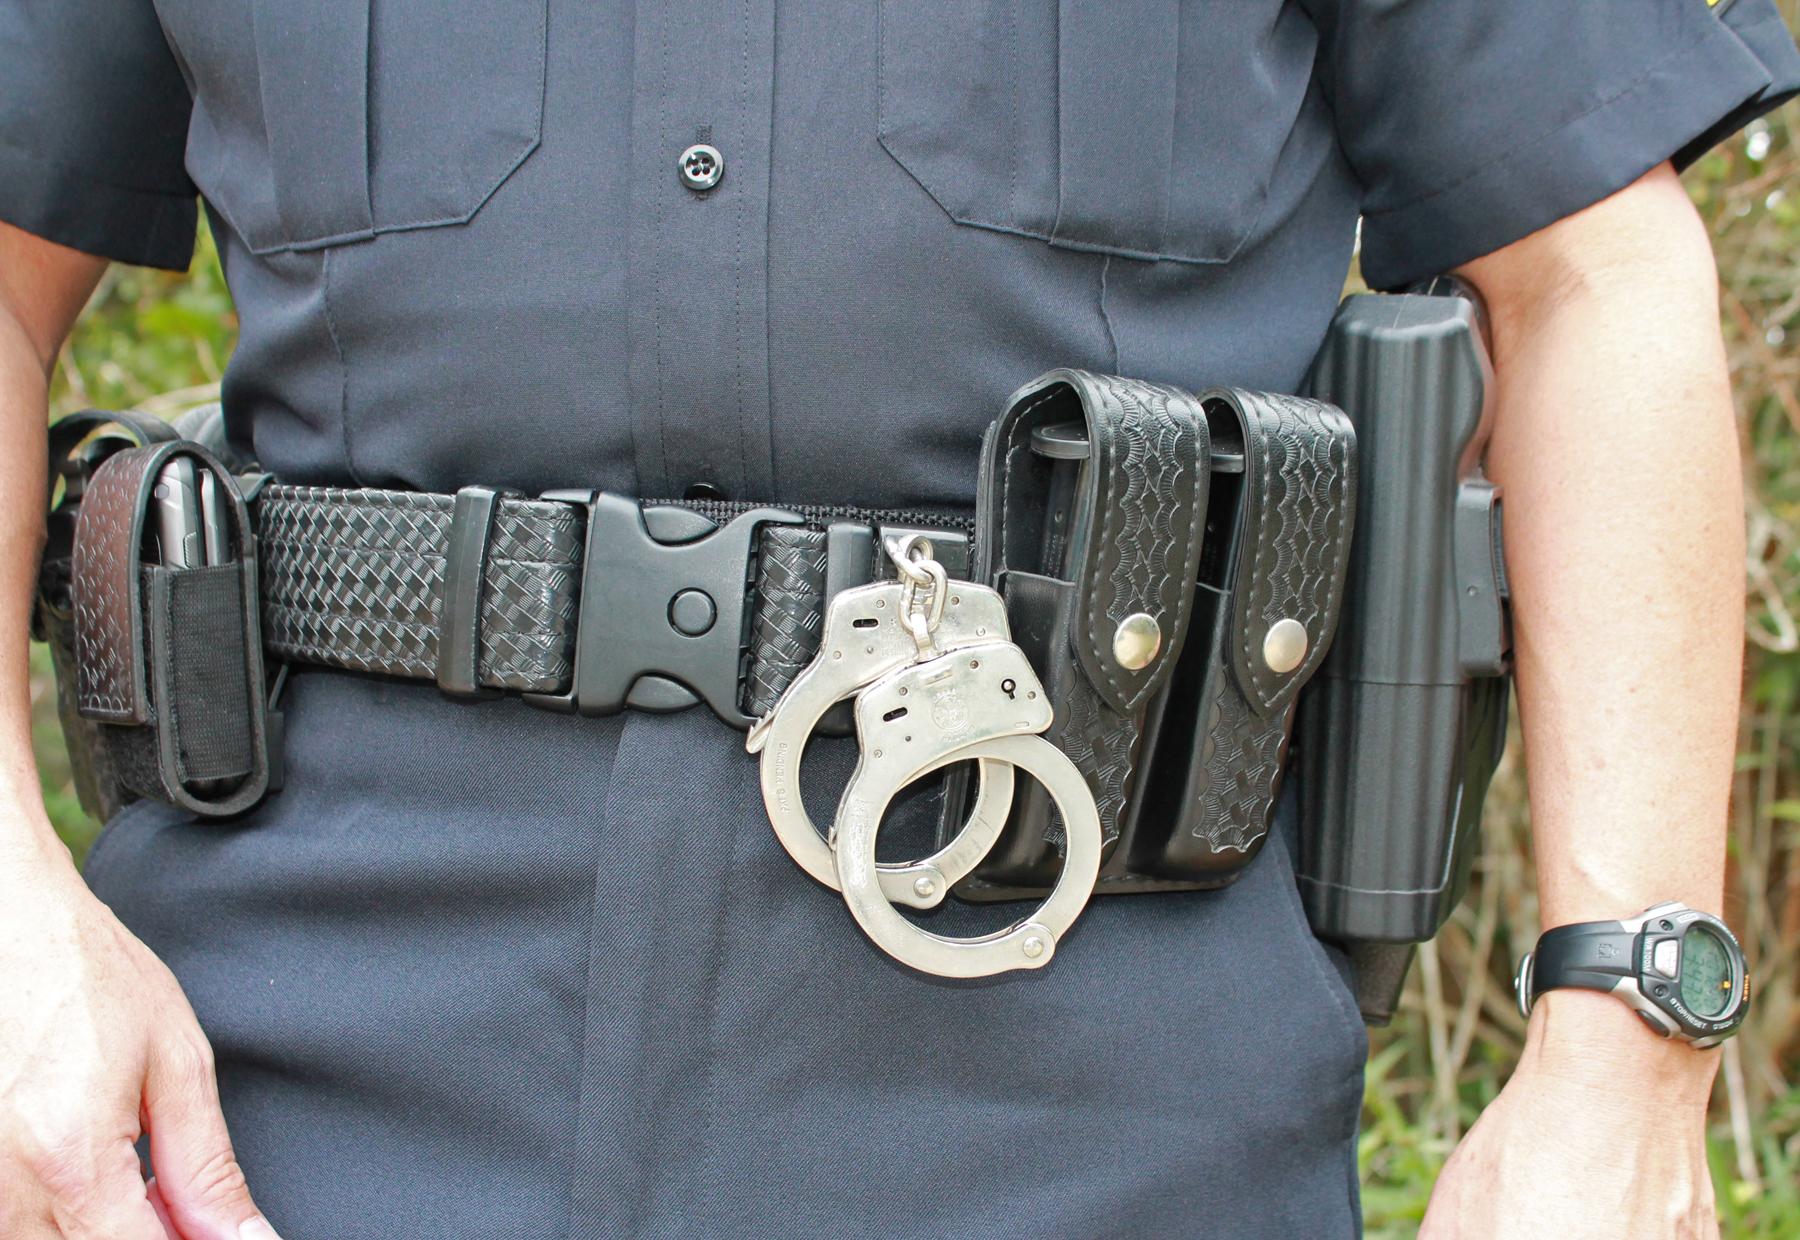 Magnetactical handcuffs